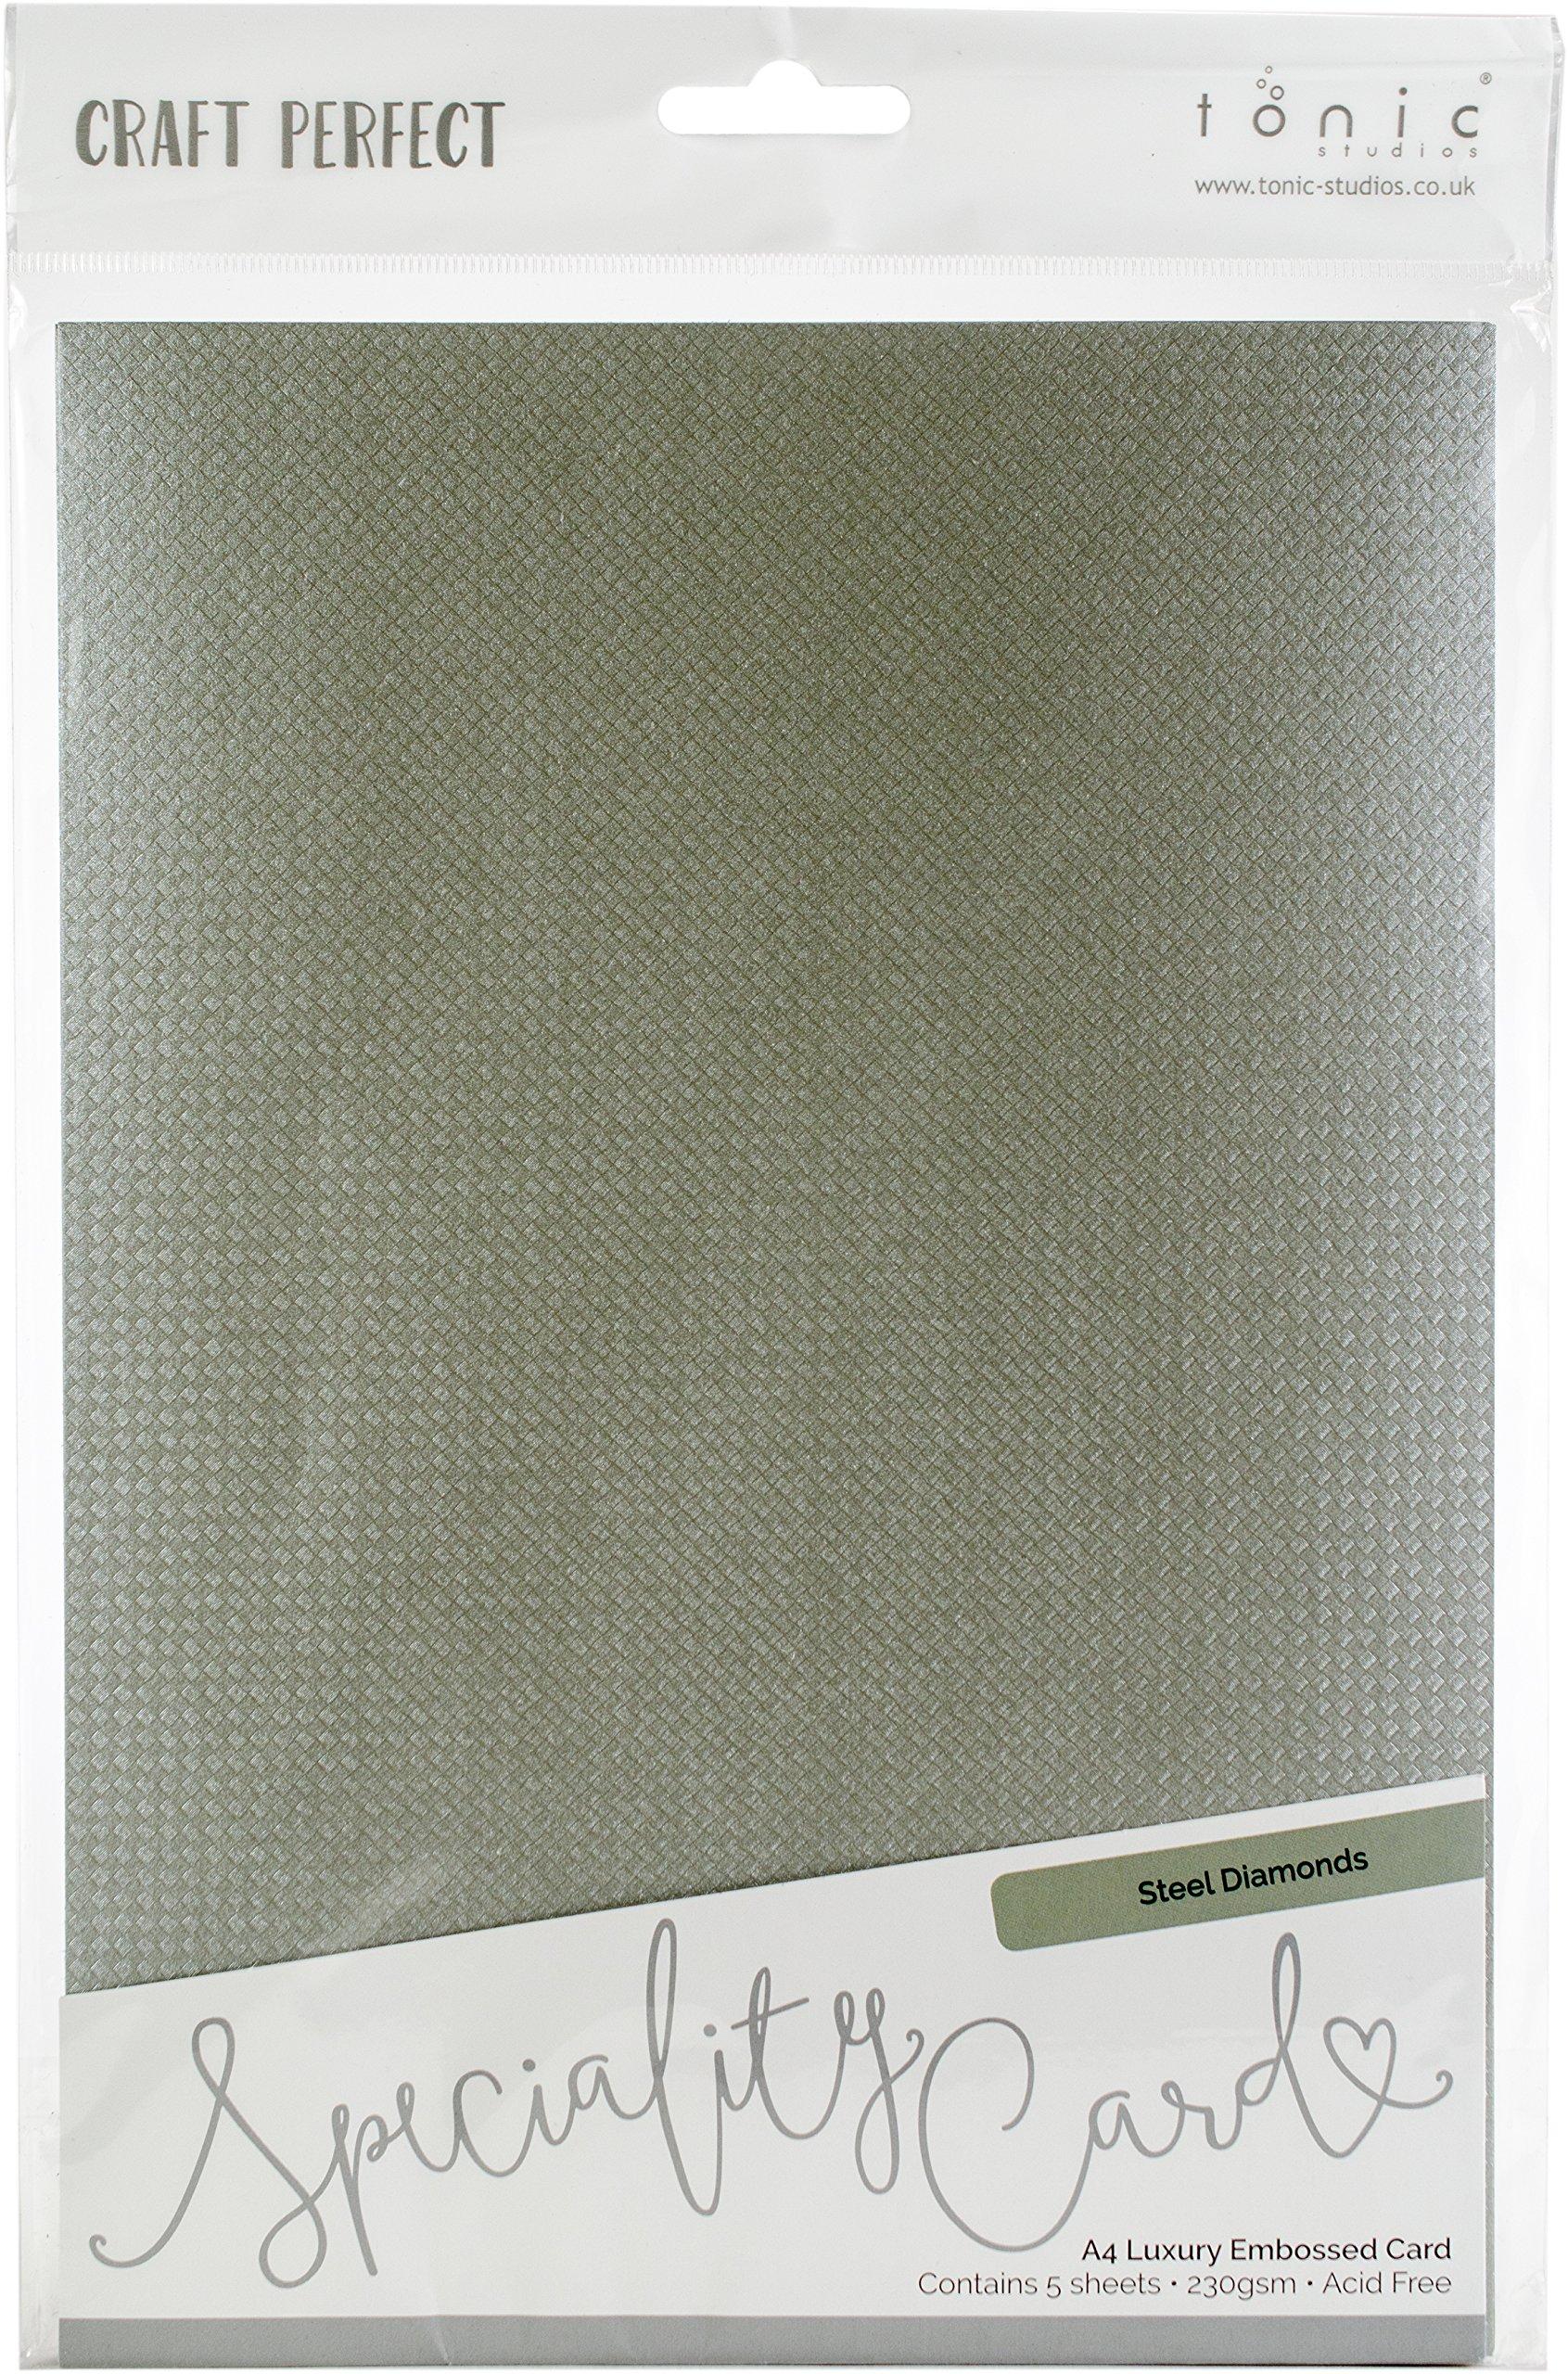 Tonic Studios 9819E Steel Diamonds Craft Perfect Luxury Embossed A4 Cardstock (5 Per Pack) Multicolor